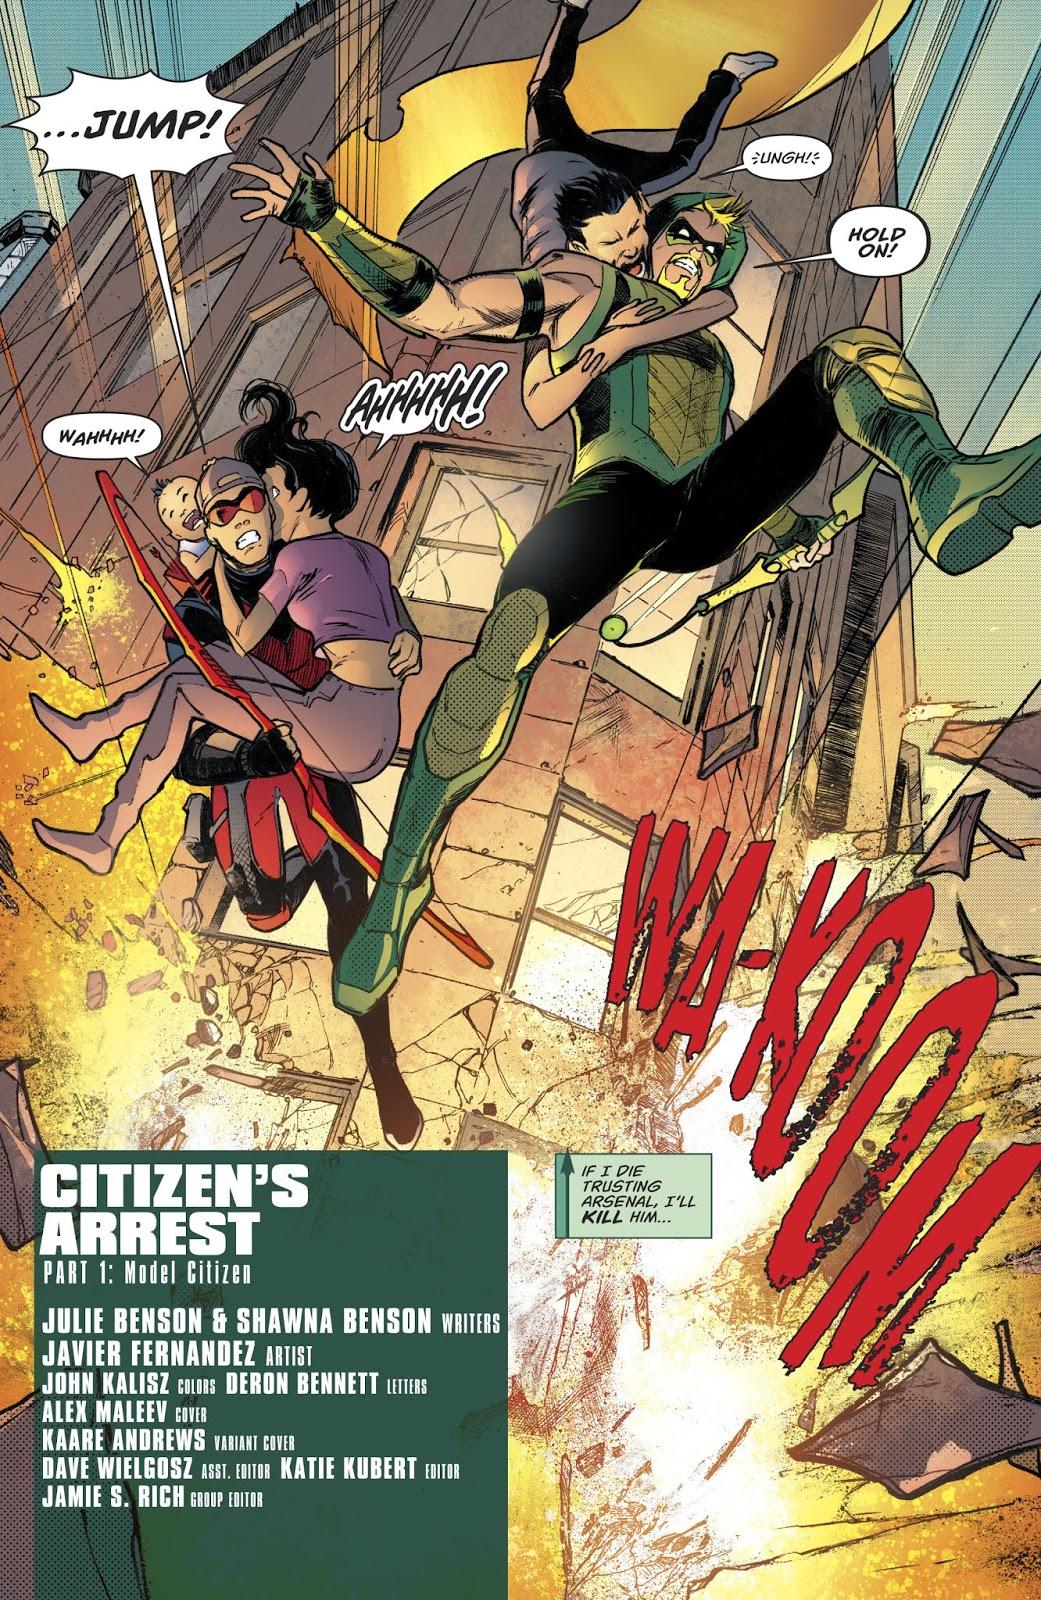 Arsenal (Green Arrow Vol. 6 #43)